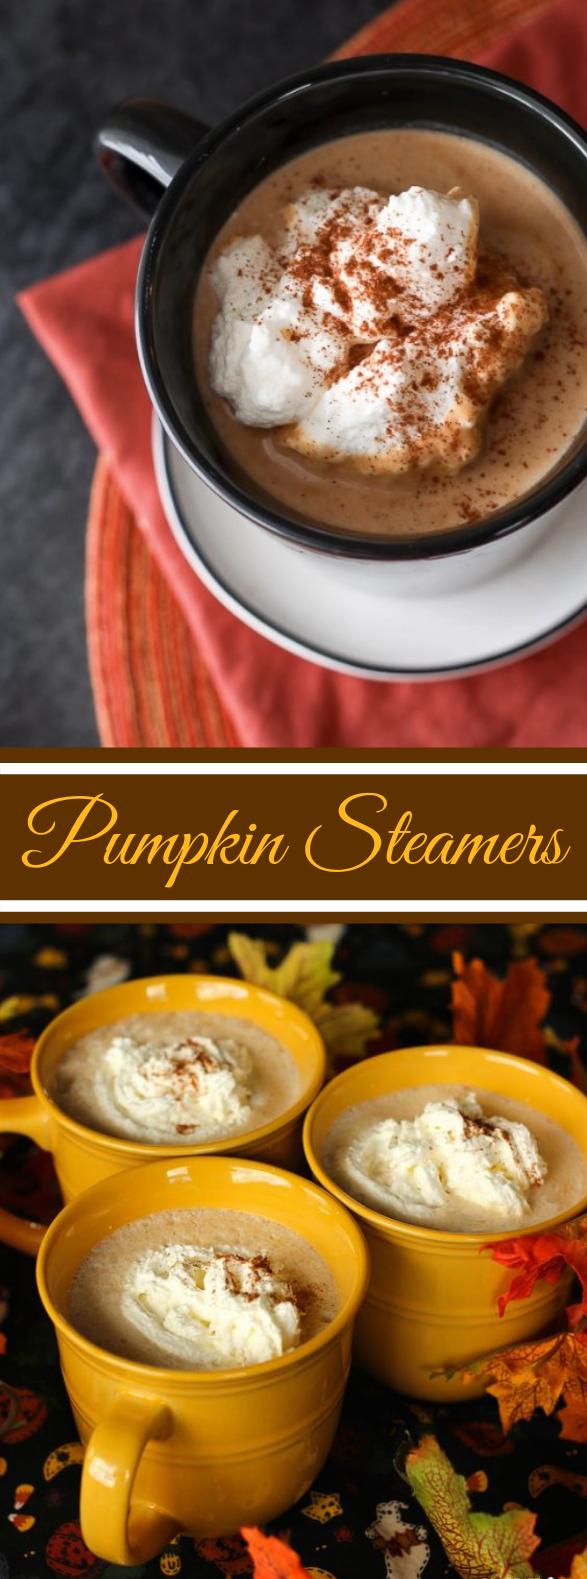 Pumpkin Spice Steamer #drinks #harvest